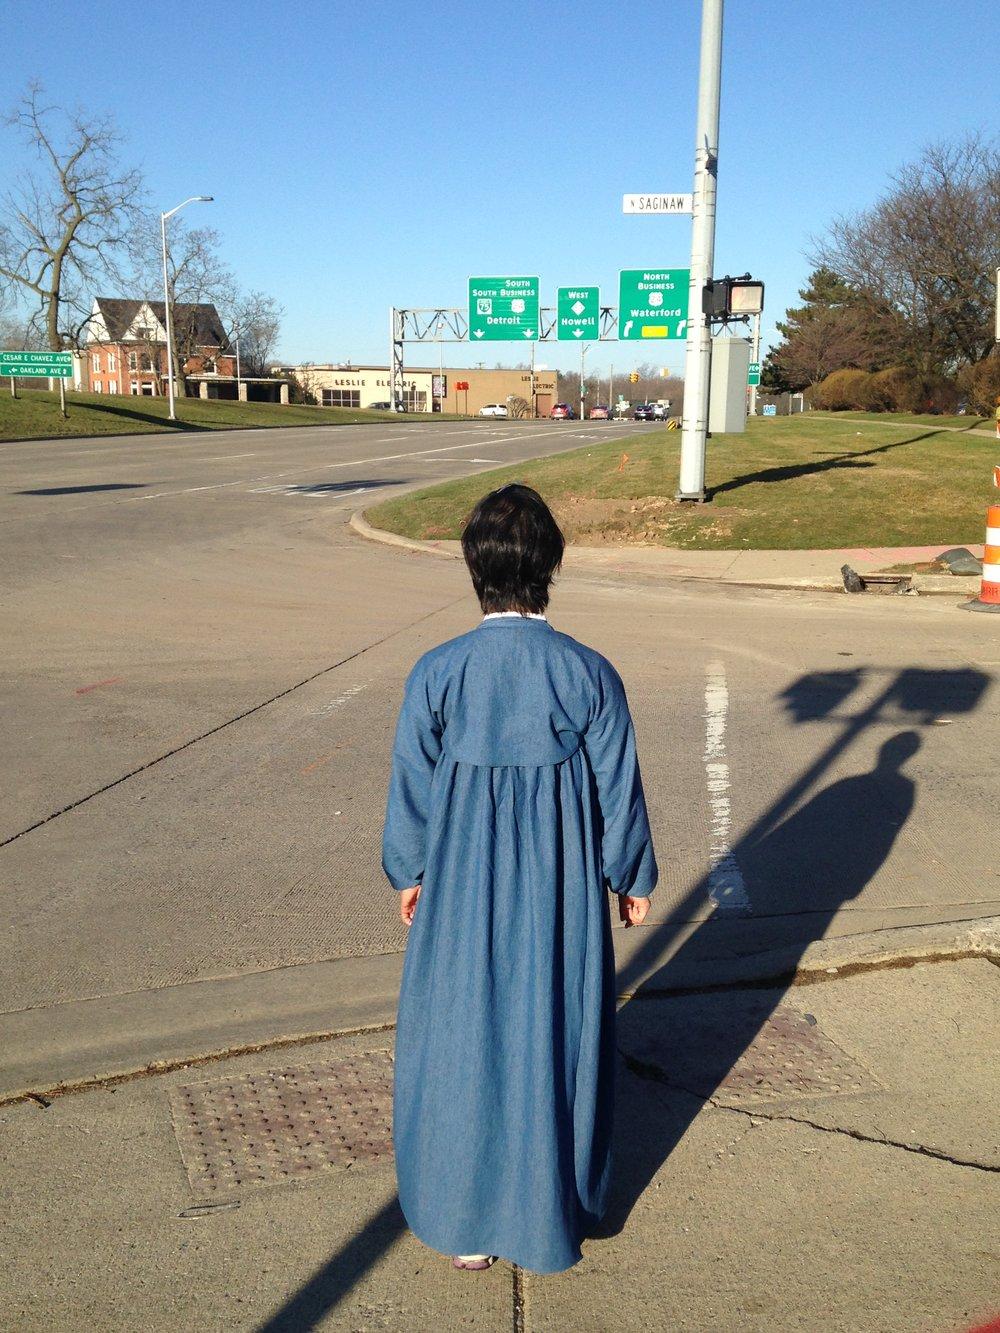 The start of the walk: Woodward and N. Saginaw, in Pontiac